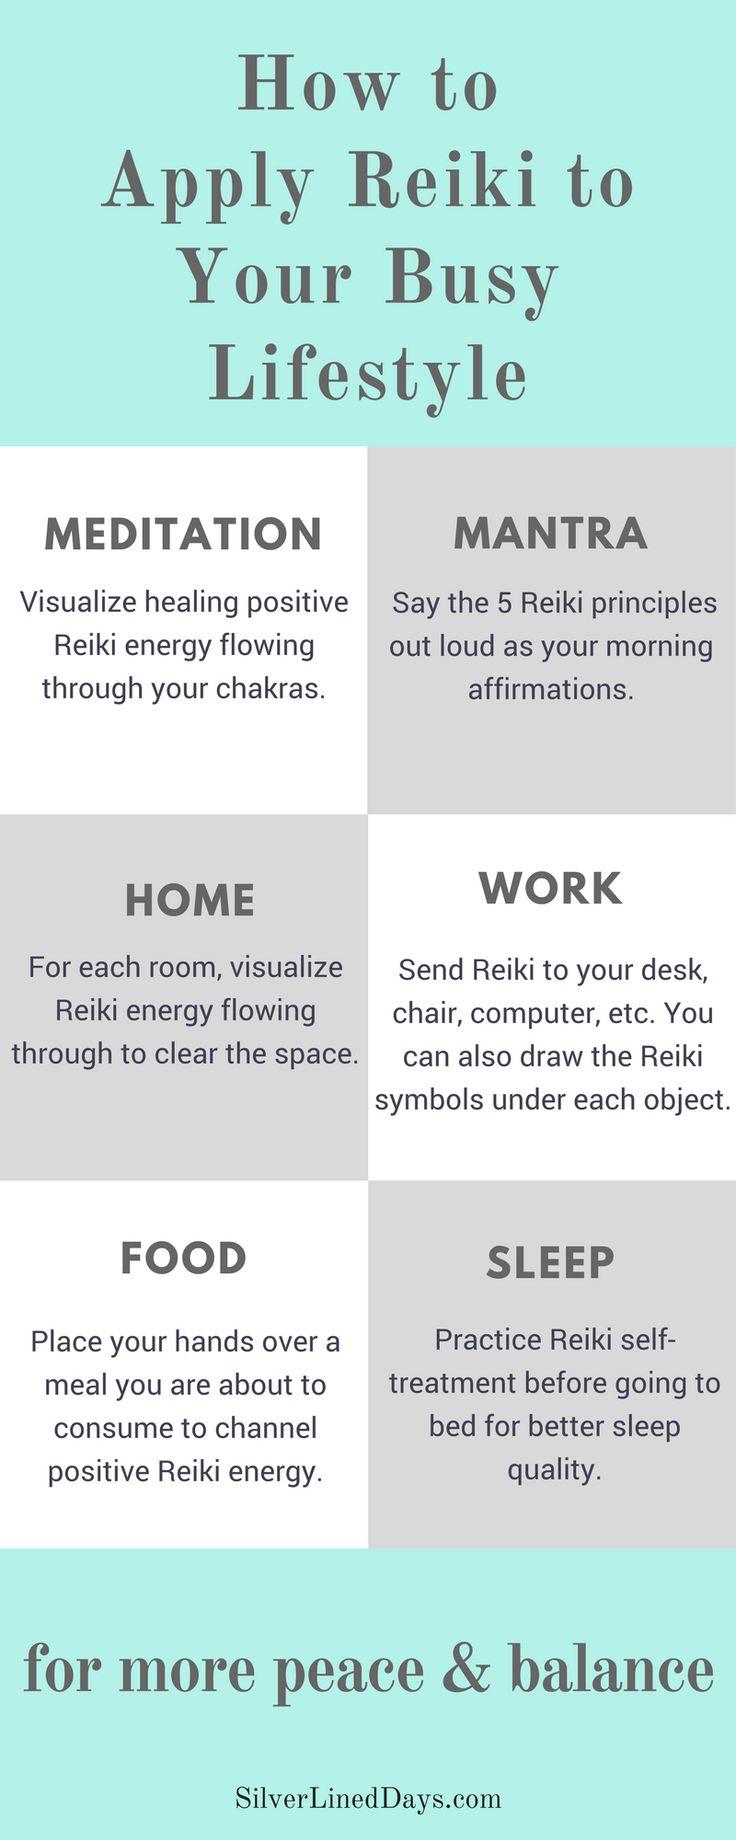 reiki healing, spirituality, chakras, holistic wellness, energy healing, law of attraction, meditation, raise vibrations